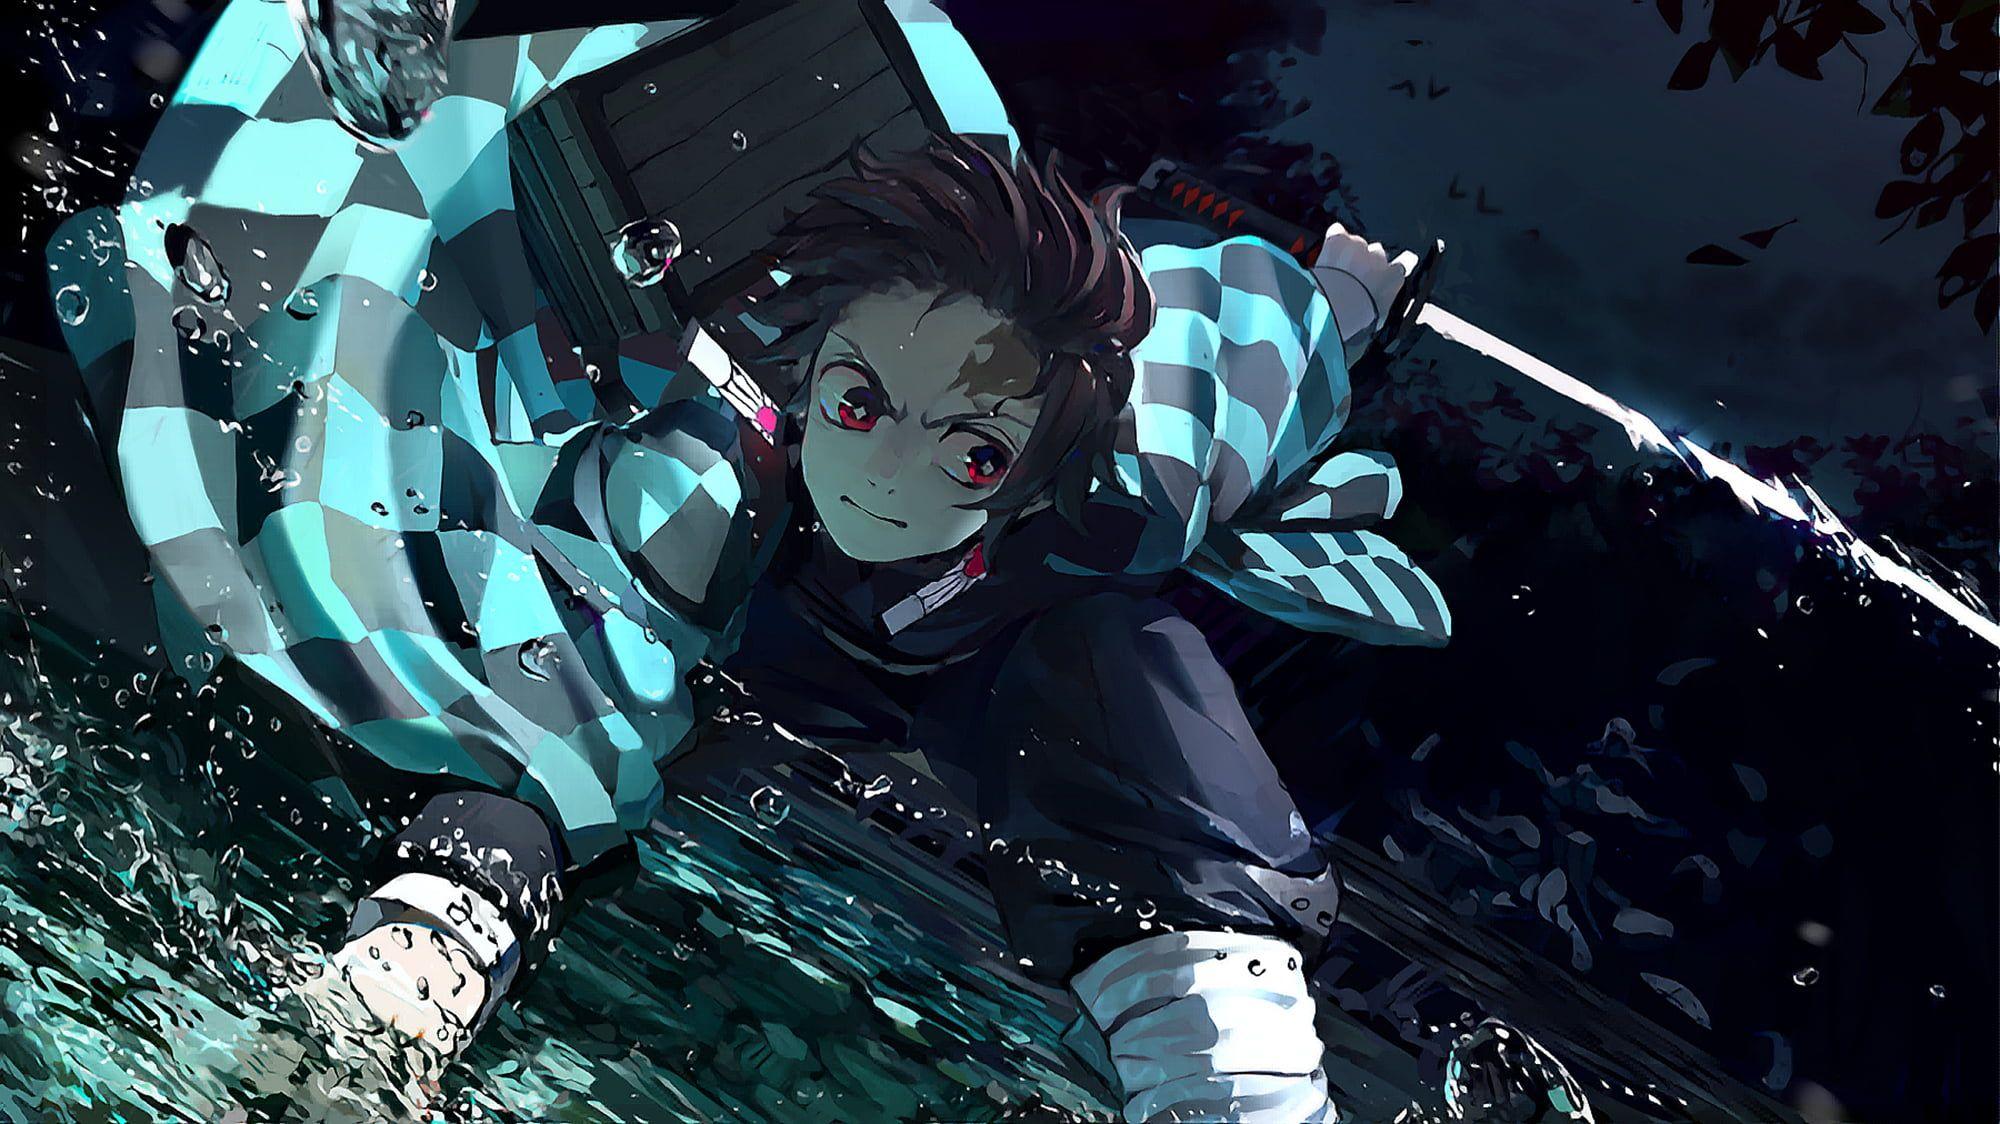 Anime Demon Slayer Kimetsu No Yaiba Tanjirou Kamado 1080p Wallpaper Hdwallpaper Deskto In 2020 Cool Anime Wallpapers Hd Anime Wallpapers Anime Wallpaper Download